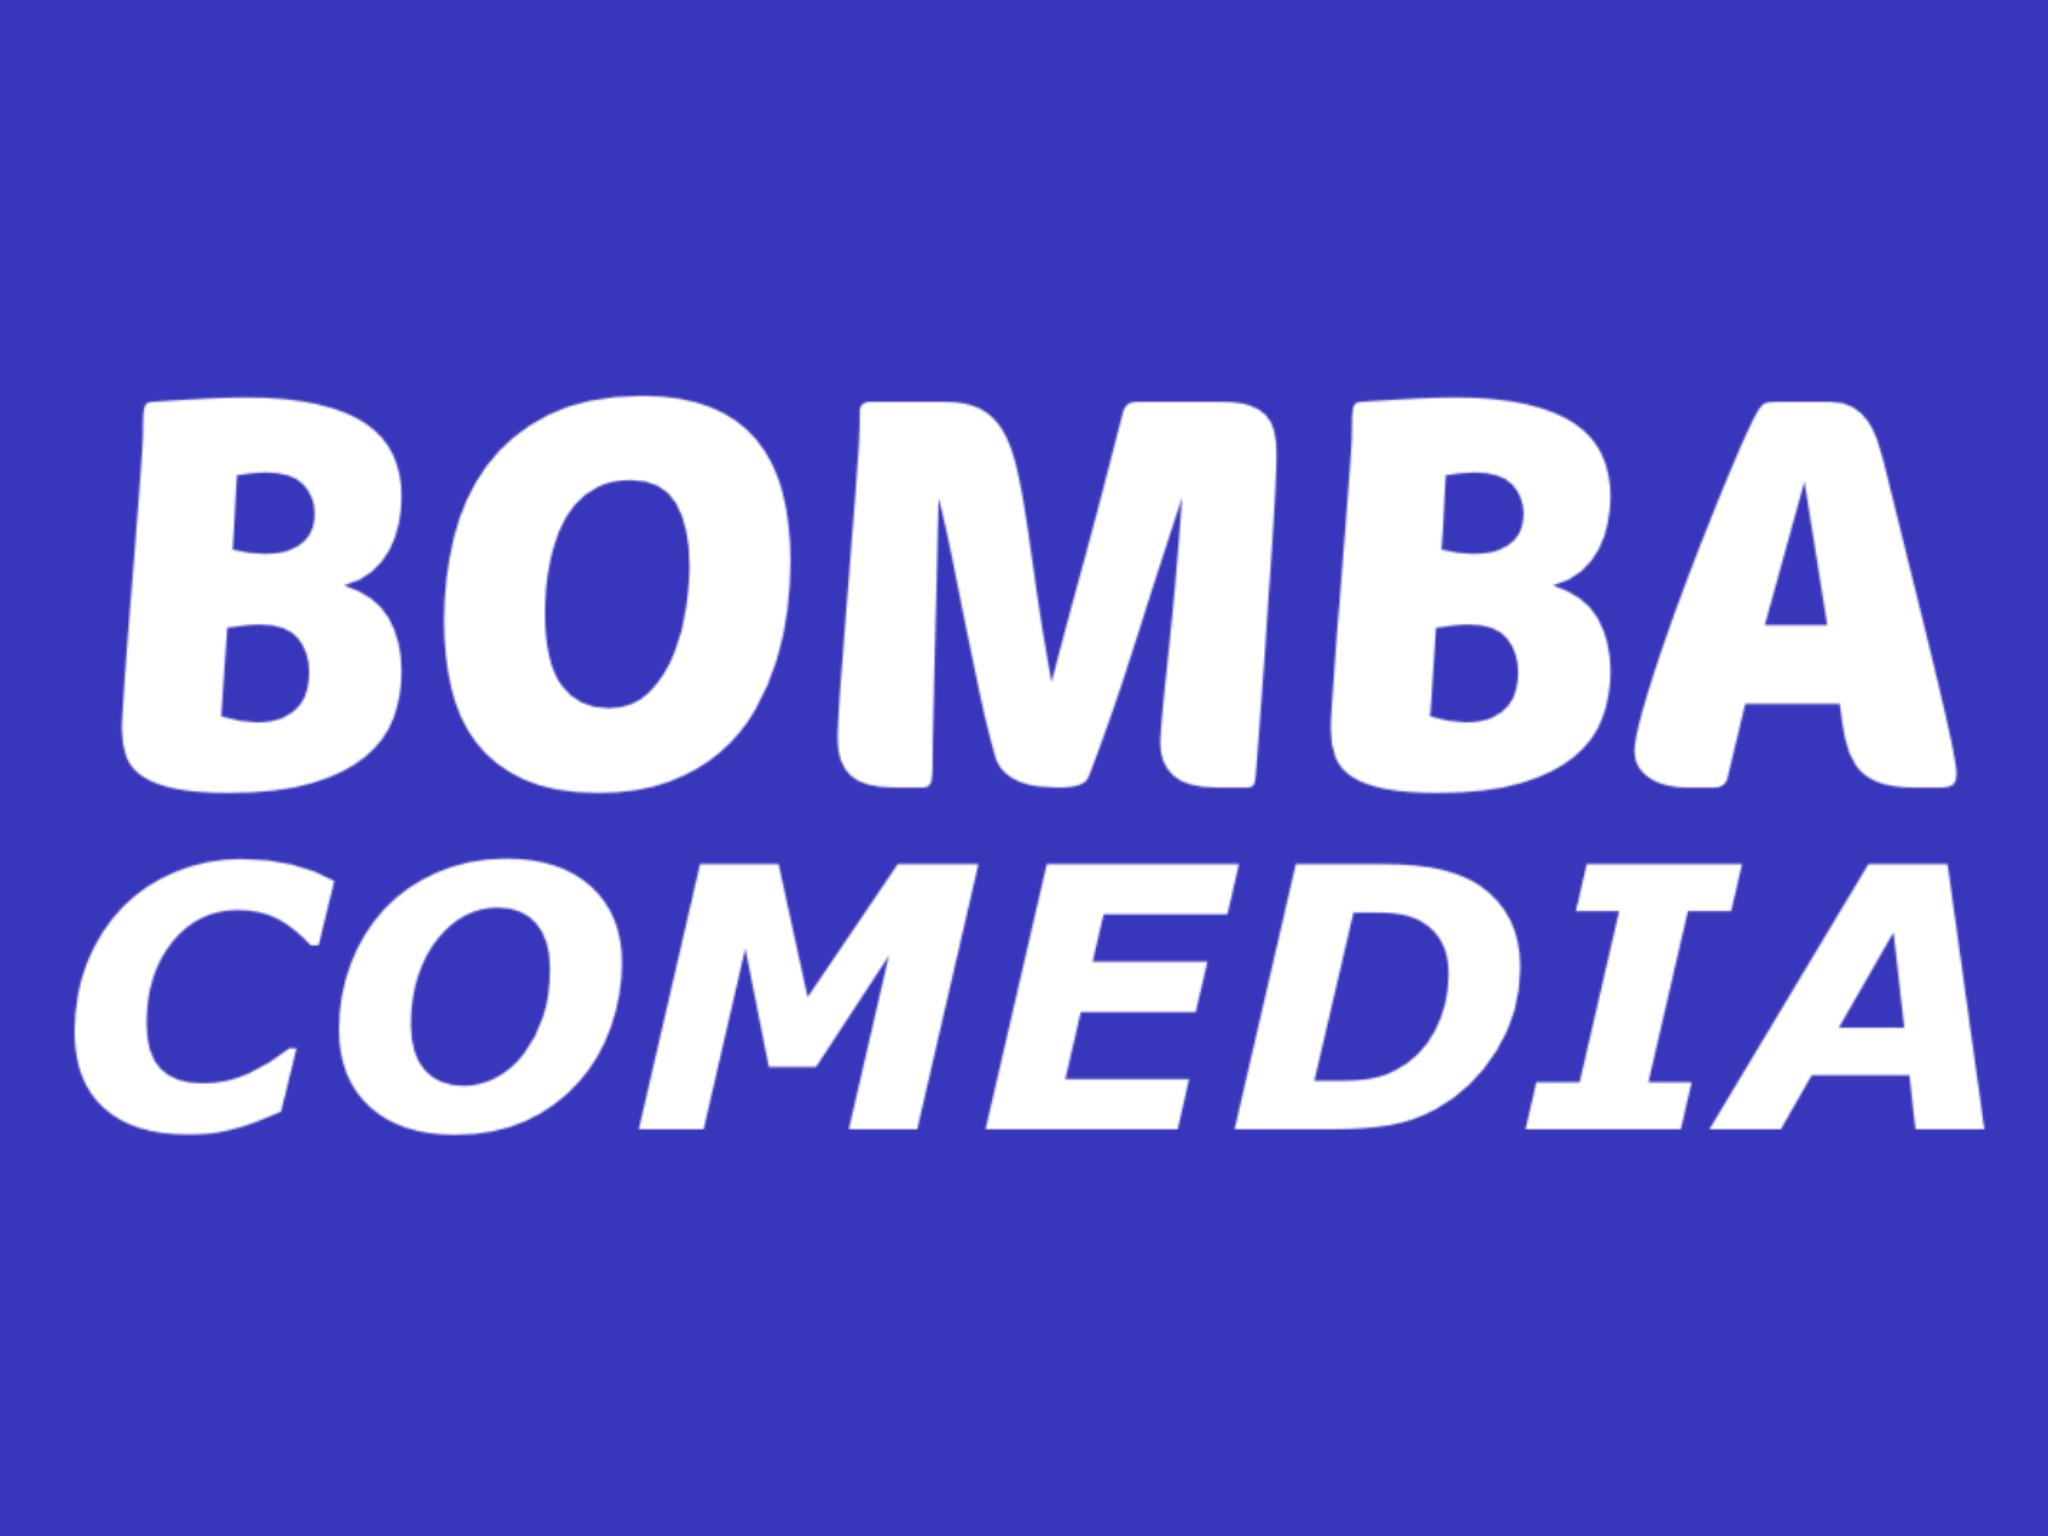 Bomba Comedia Logo (Green Screen)